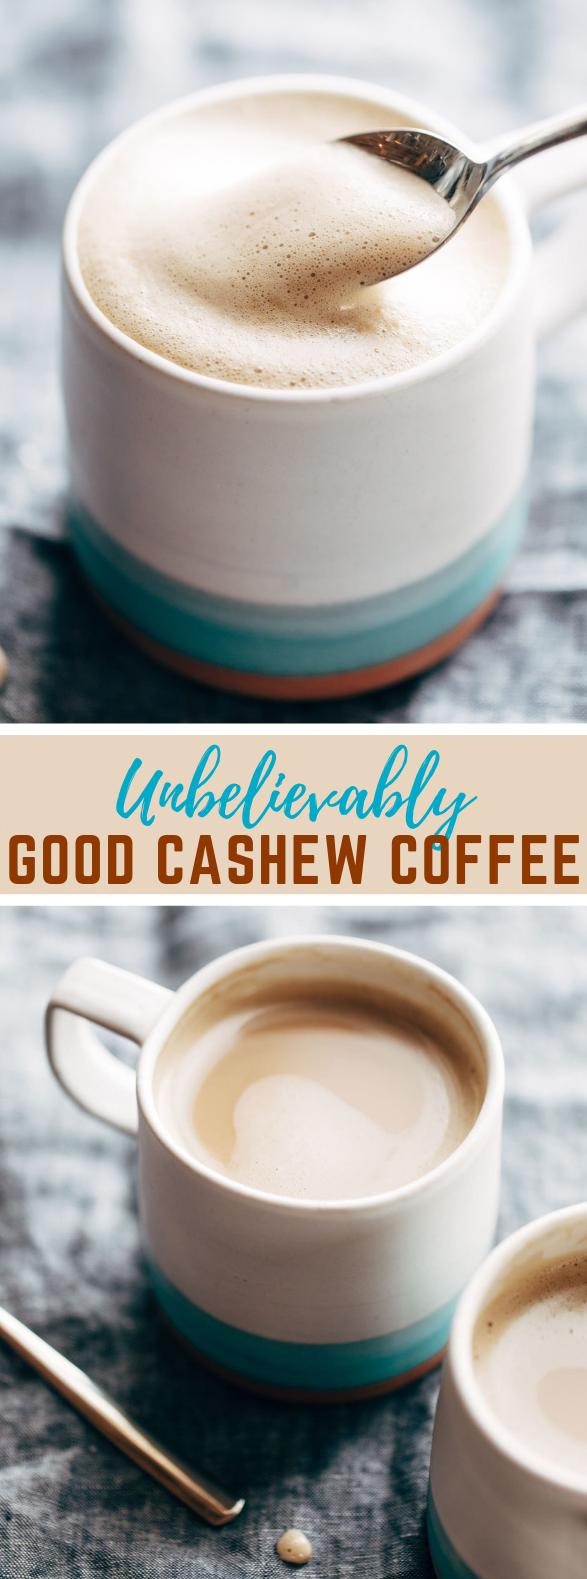 Unbelievably Good Cashew Coffee #drink #nutrition